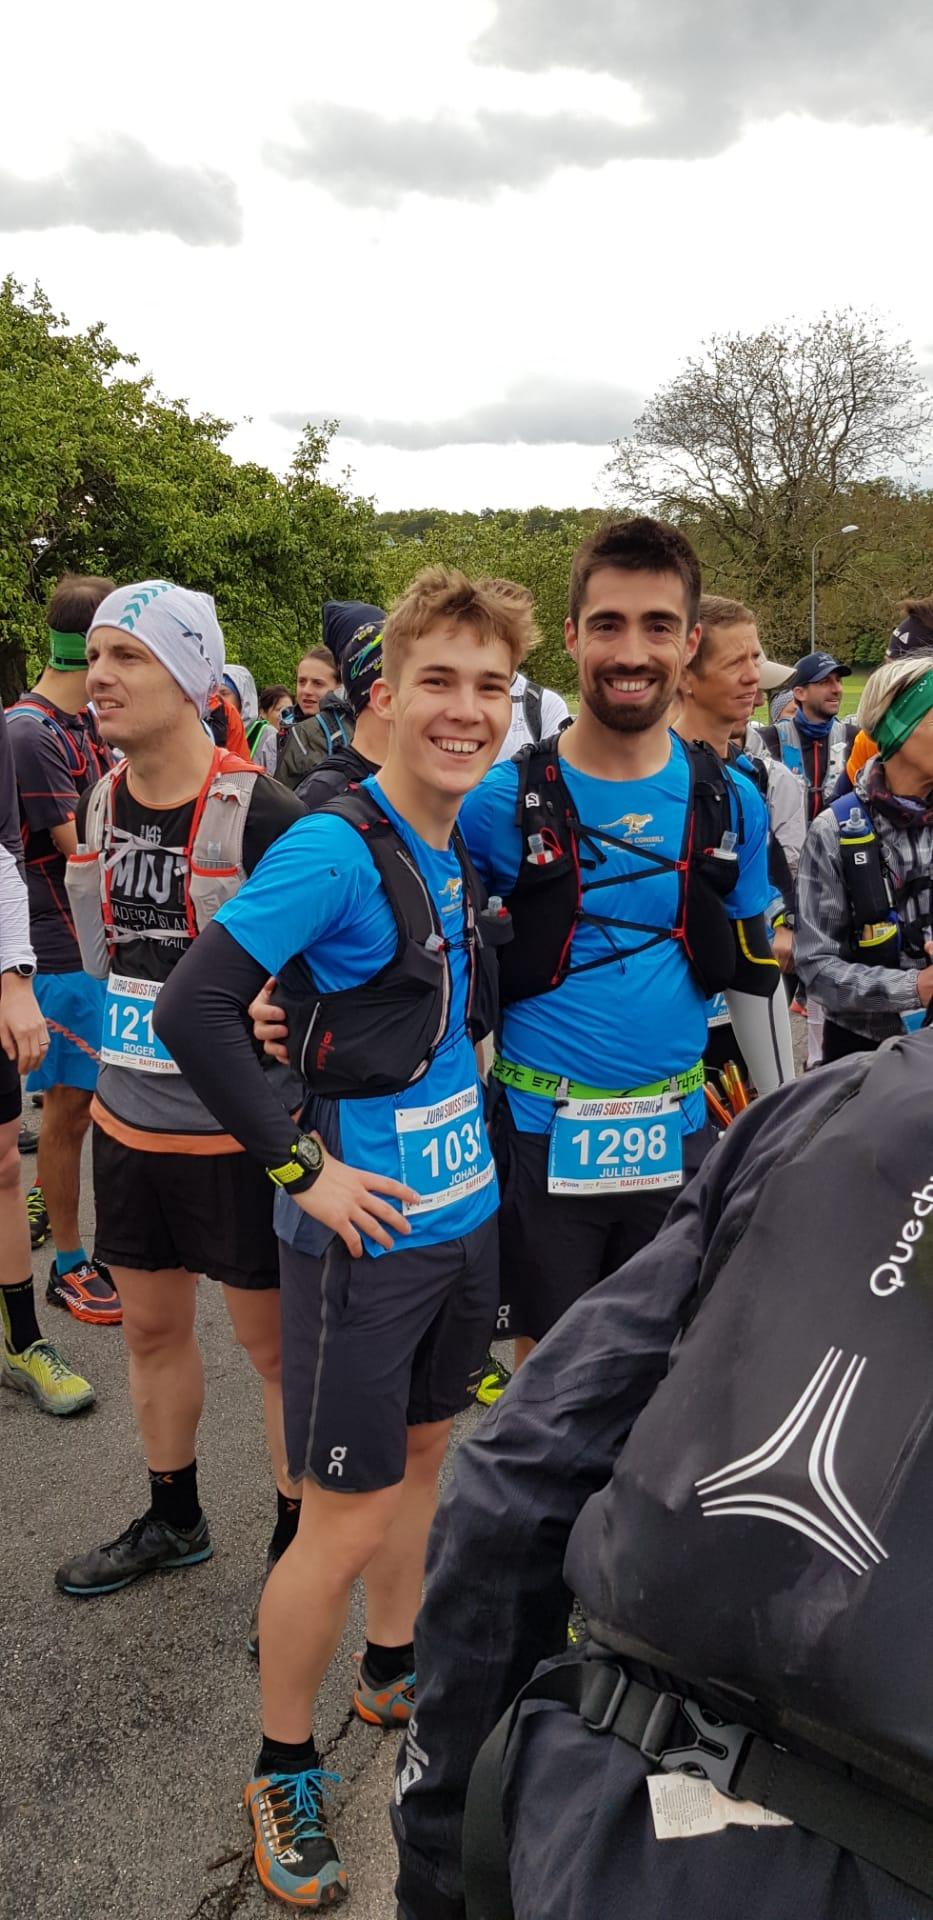 Yohan et Julien